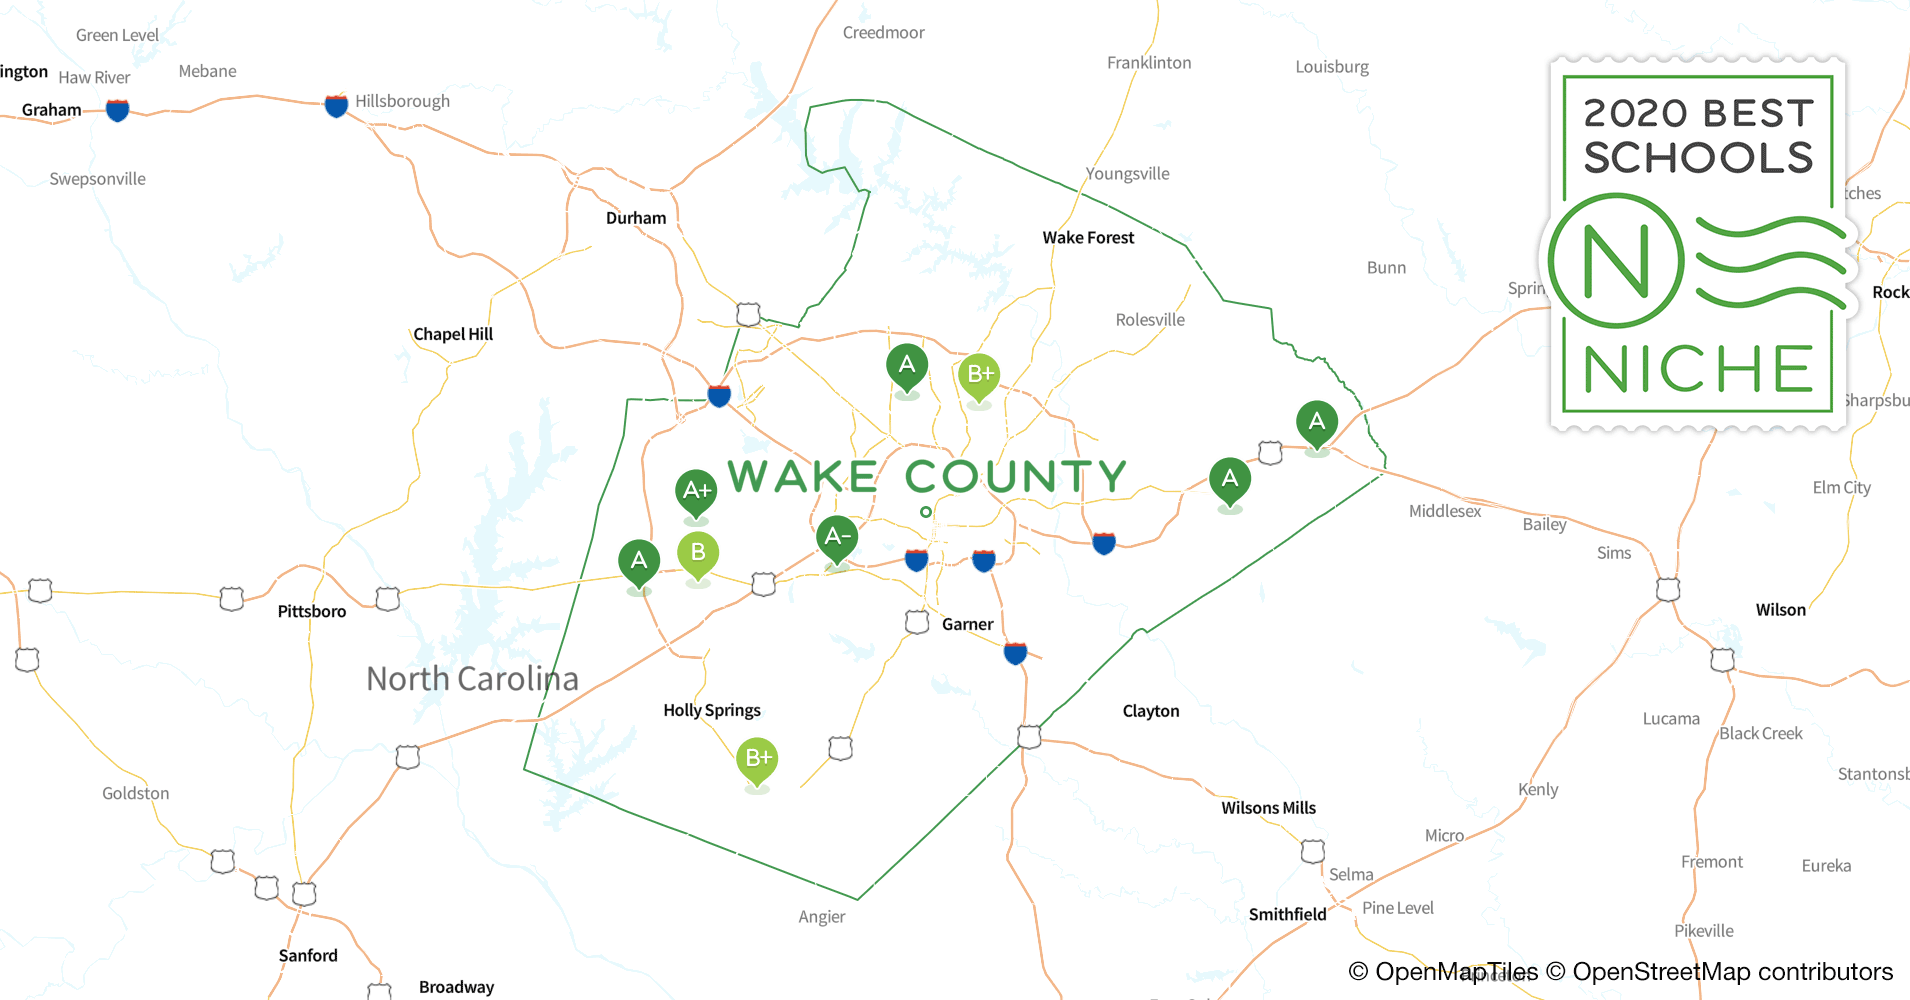 2020 Best Public Elementary Schools In Wake County, Nc – Niche Regarding List Of Year Round School In Wake County